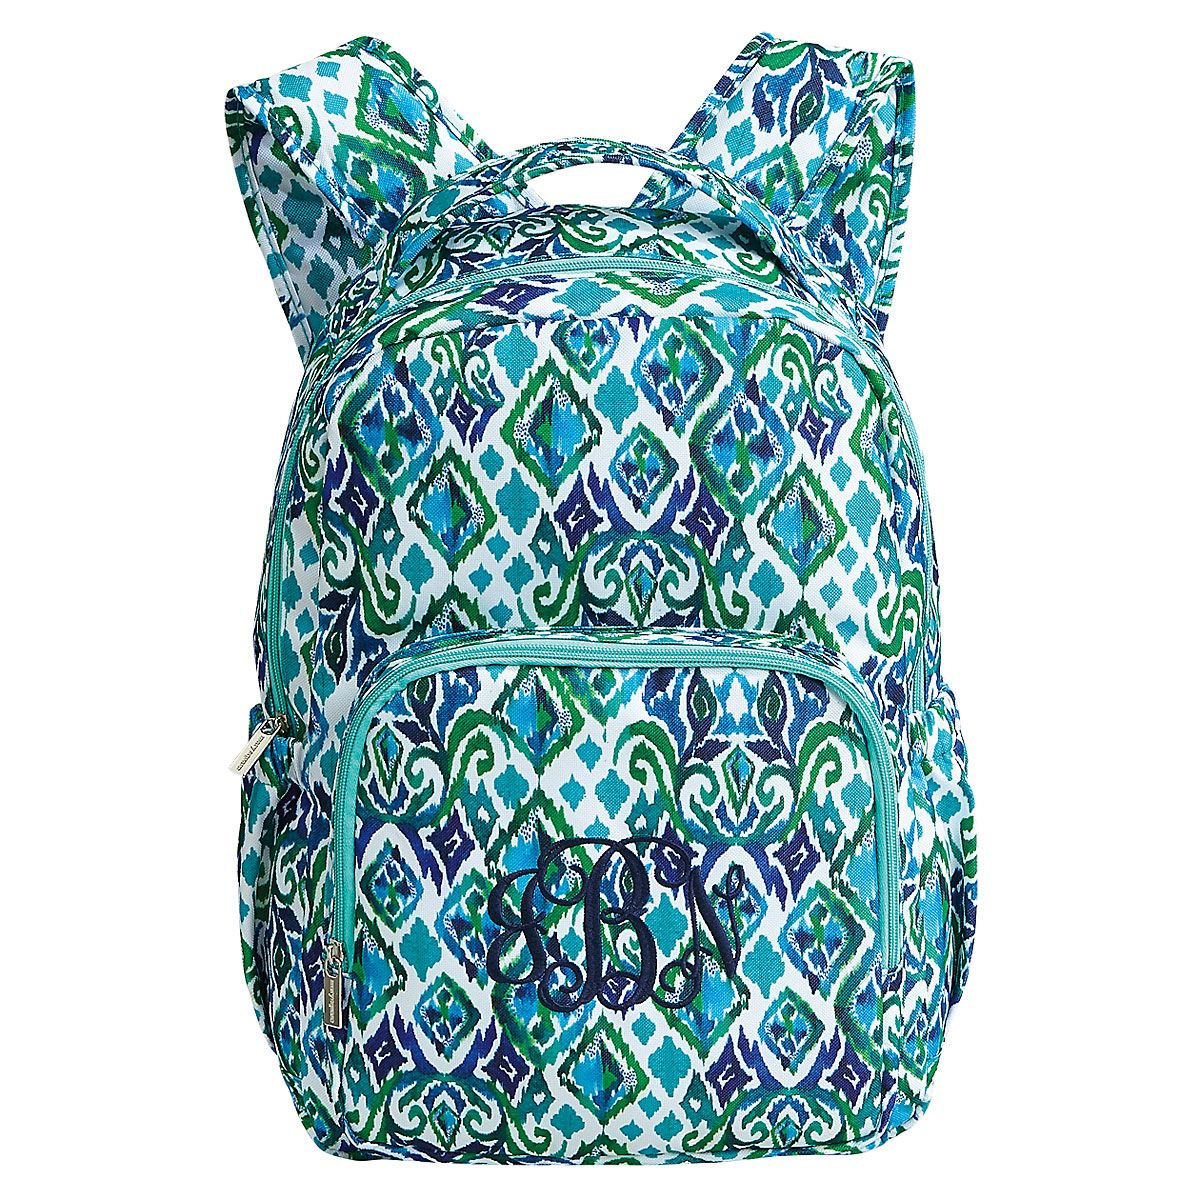 Blue Diamond Backpack - Name